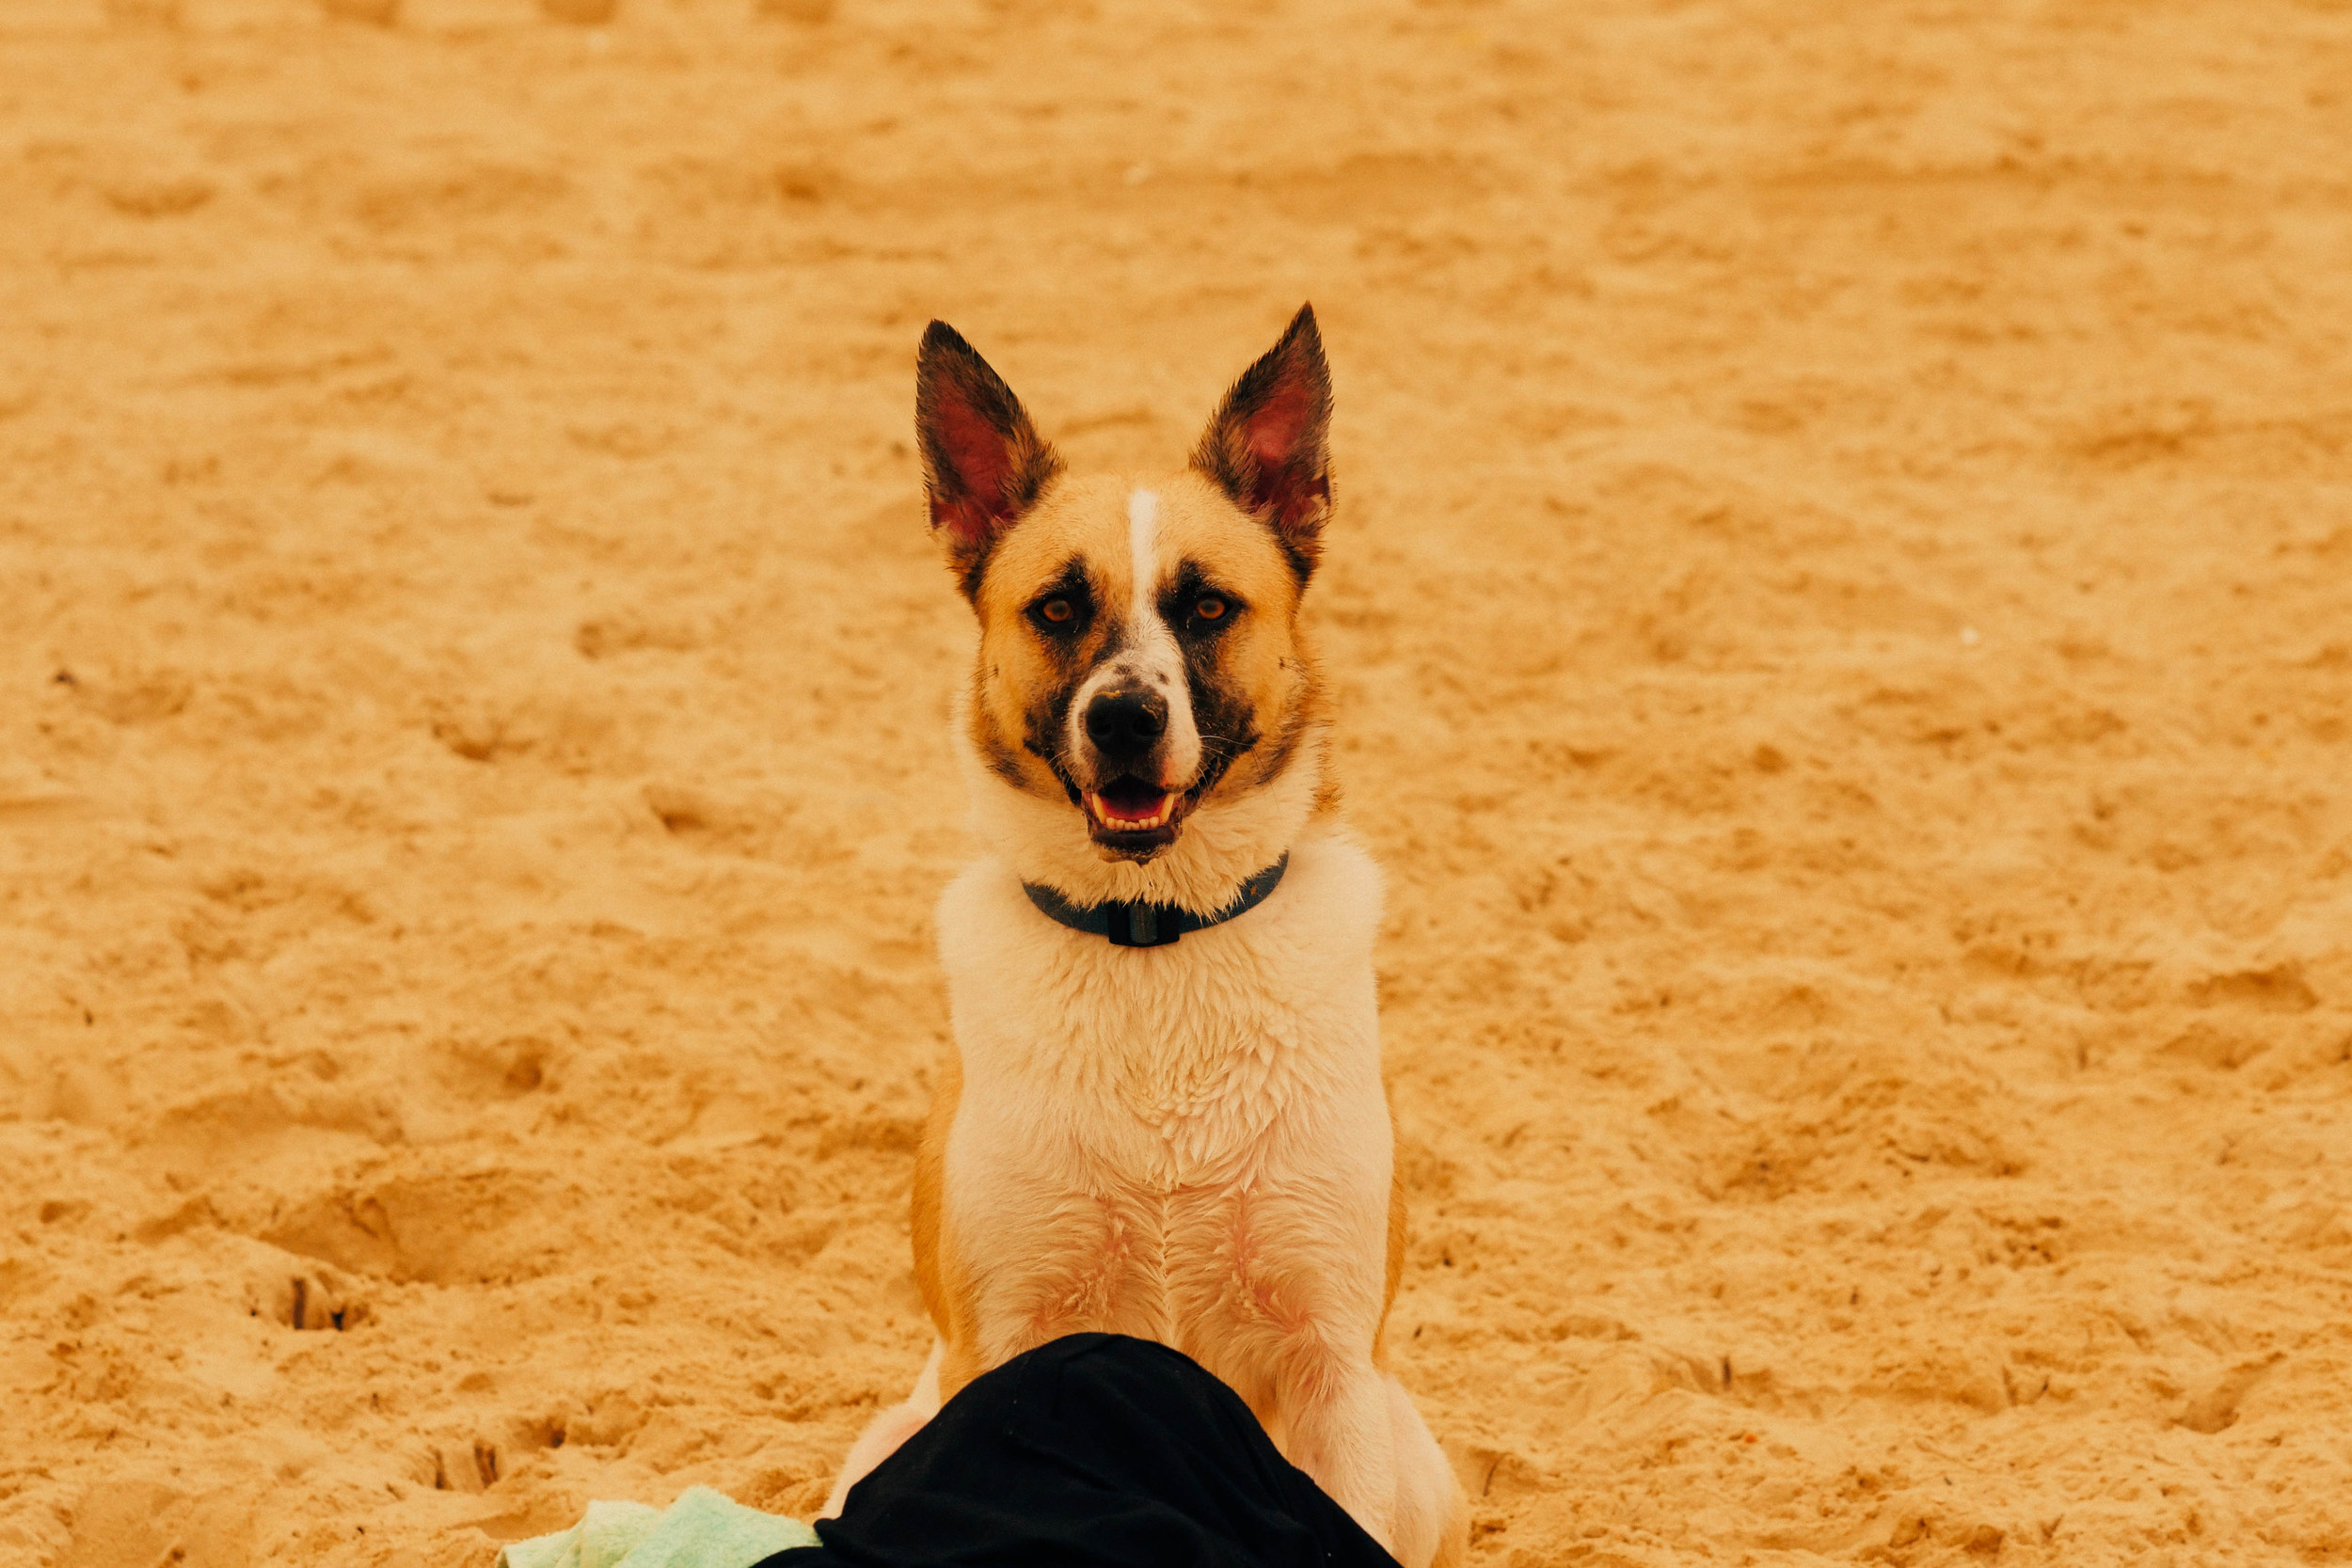 Cameleon dog